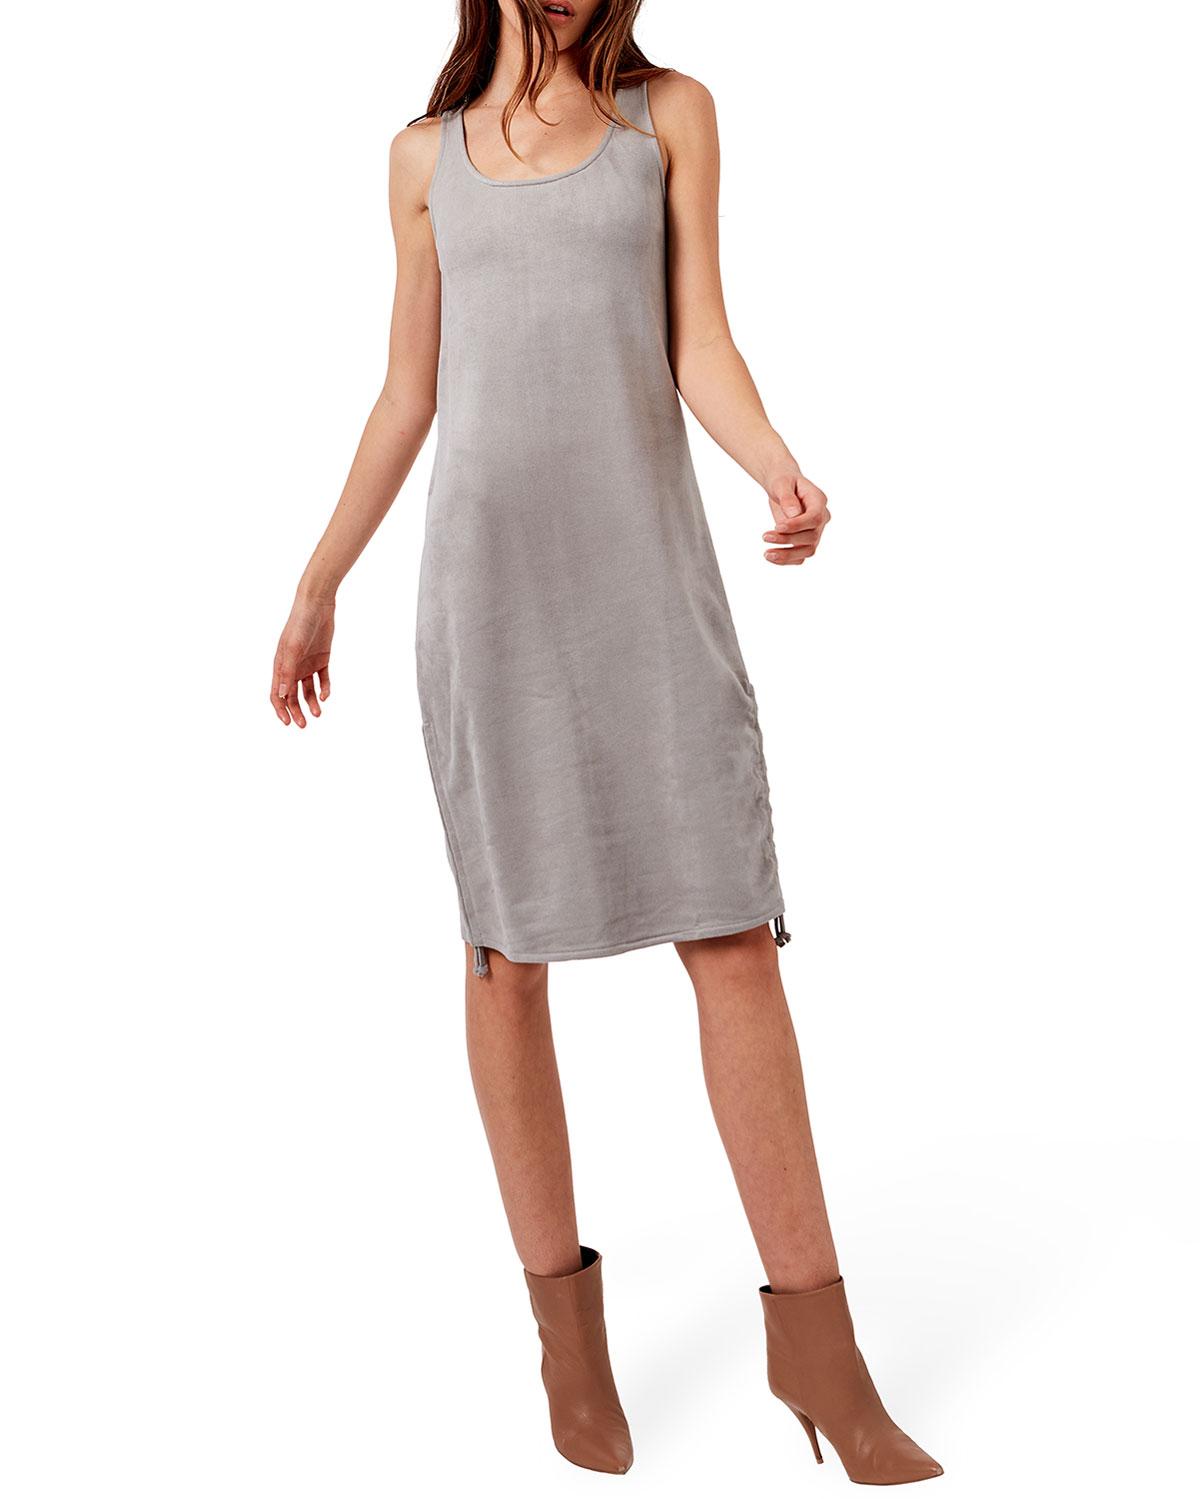 Zoe Sleeveless Vegan-Suede Terry Dress